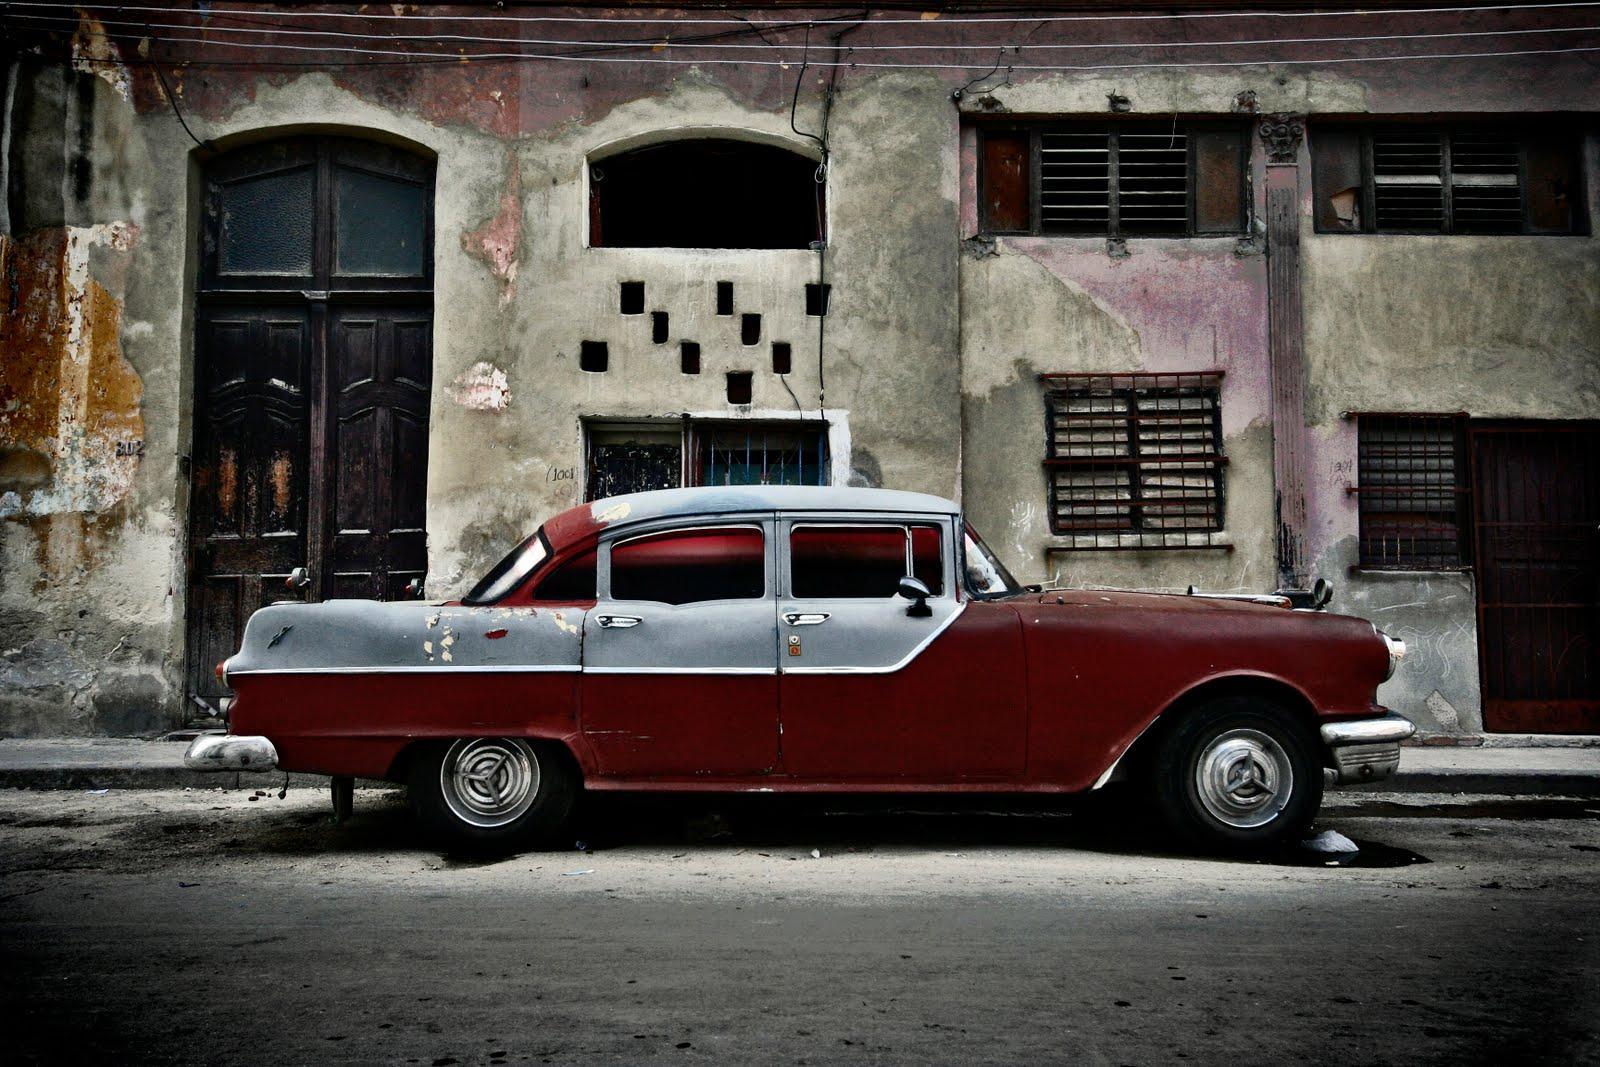 American+Car%2C+Havana%2C+Cuba+2007+by+Rupert+England.jpg (JPEG-Grafik, 1600×1067 Pixel) - Skaliert (58%)